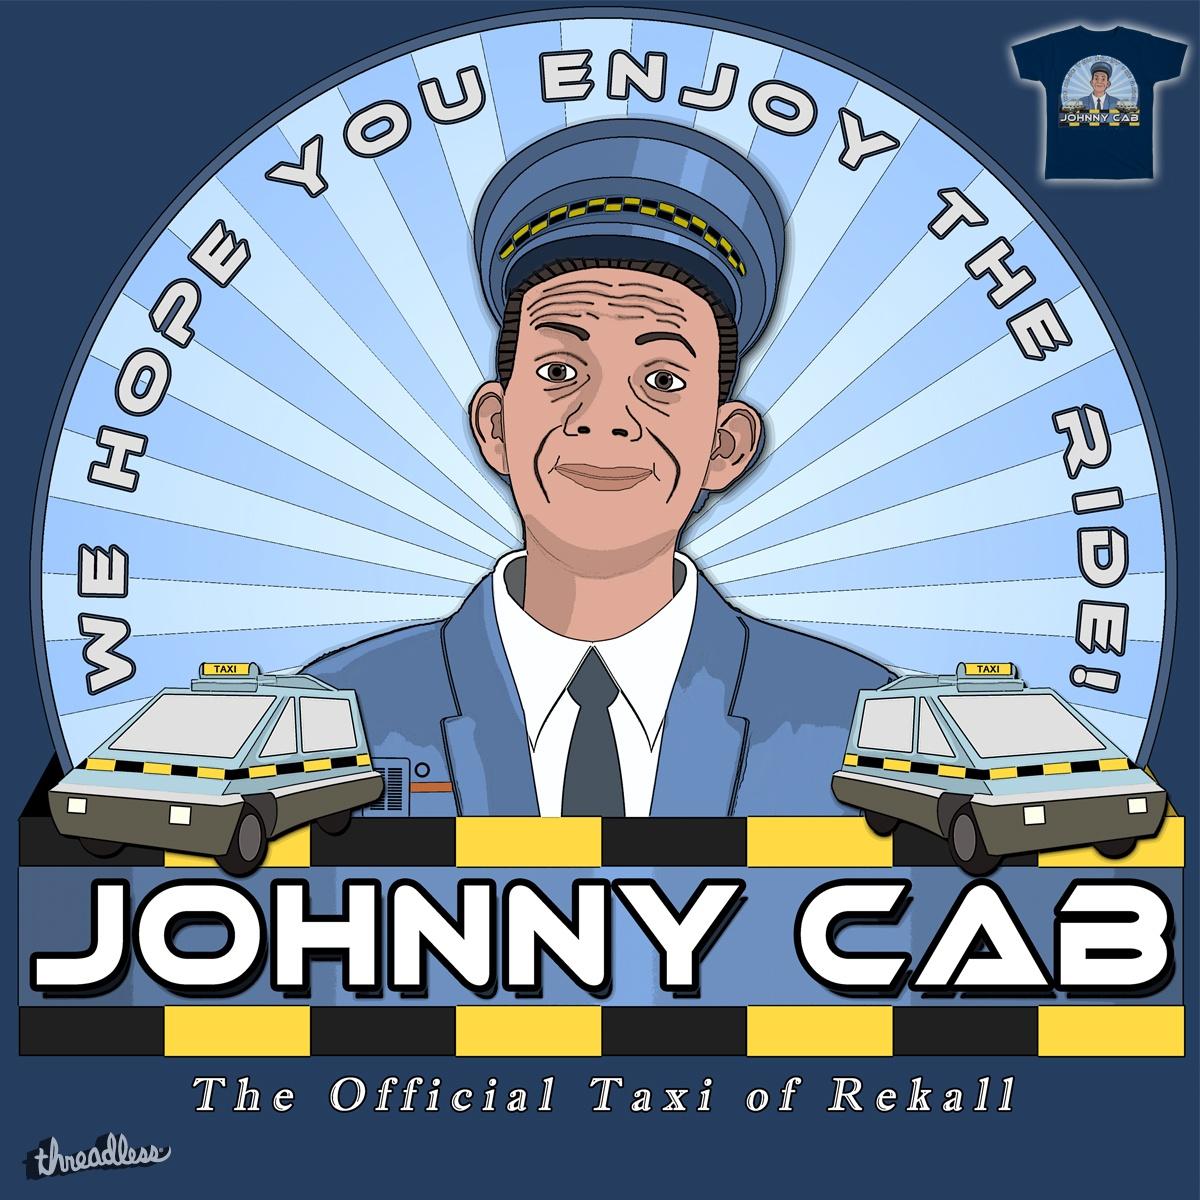 Johnny Cab by agunstreetgirl on Threadless